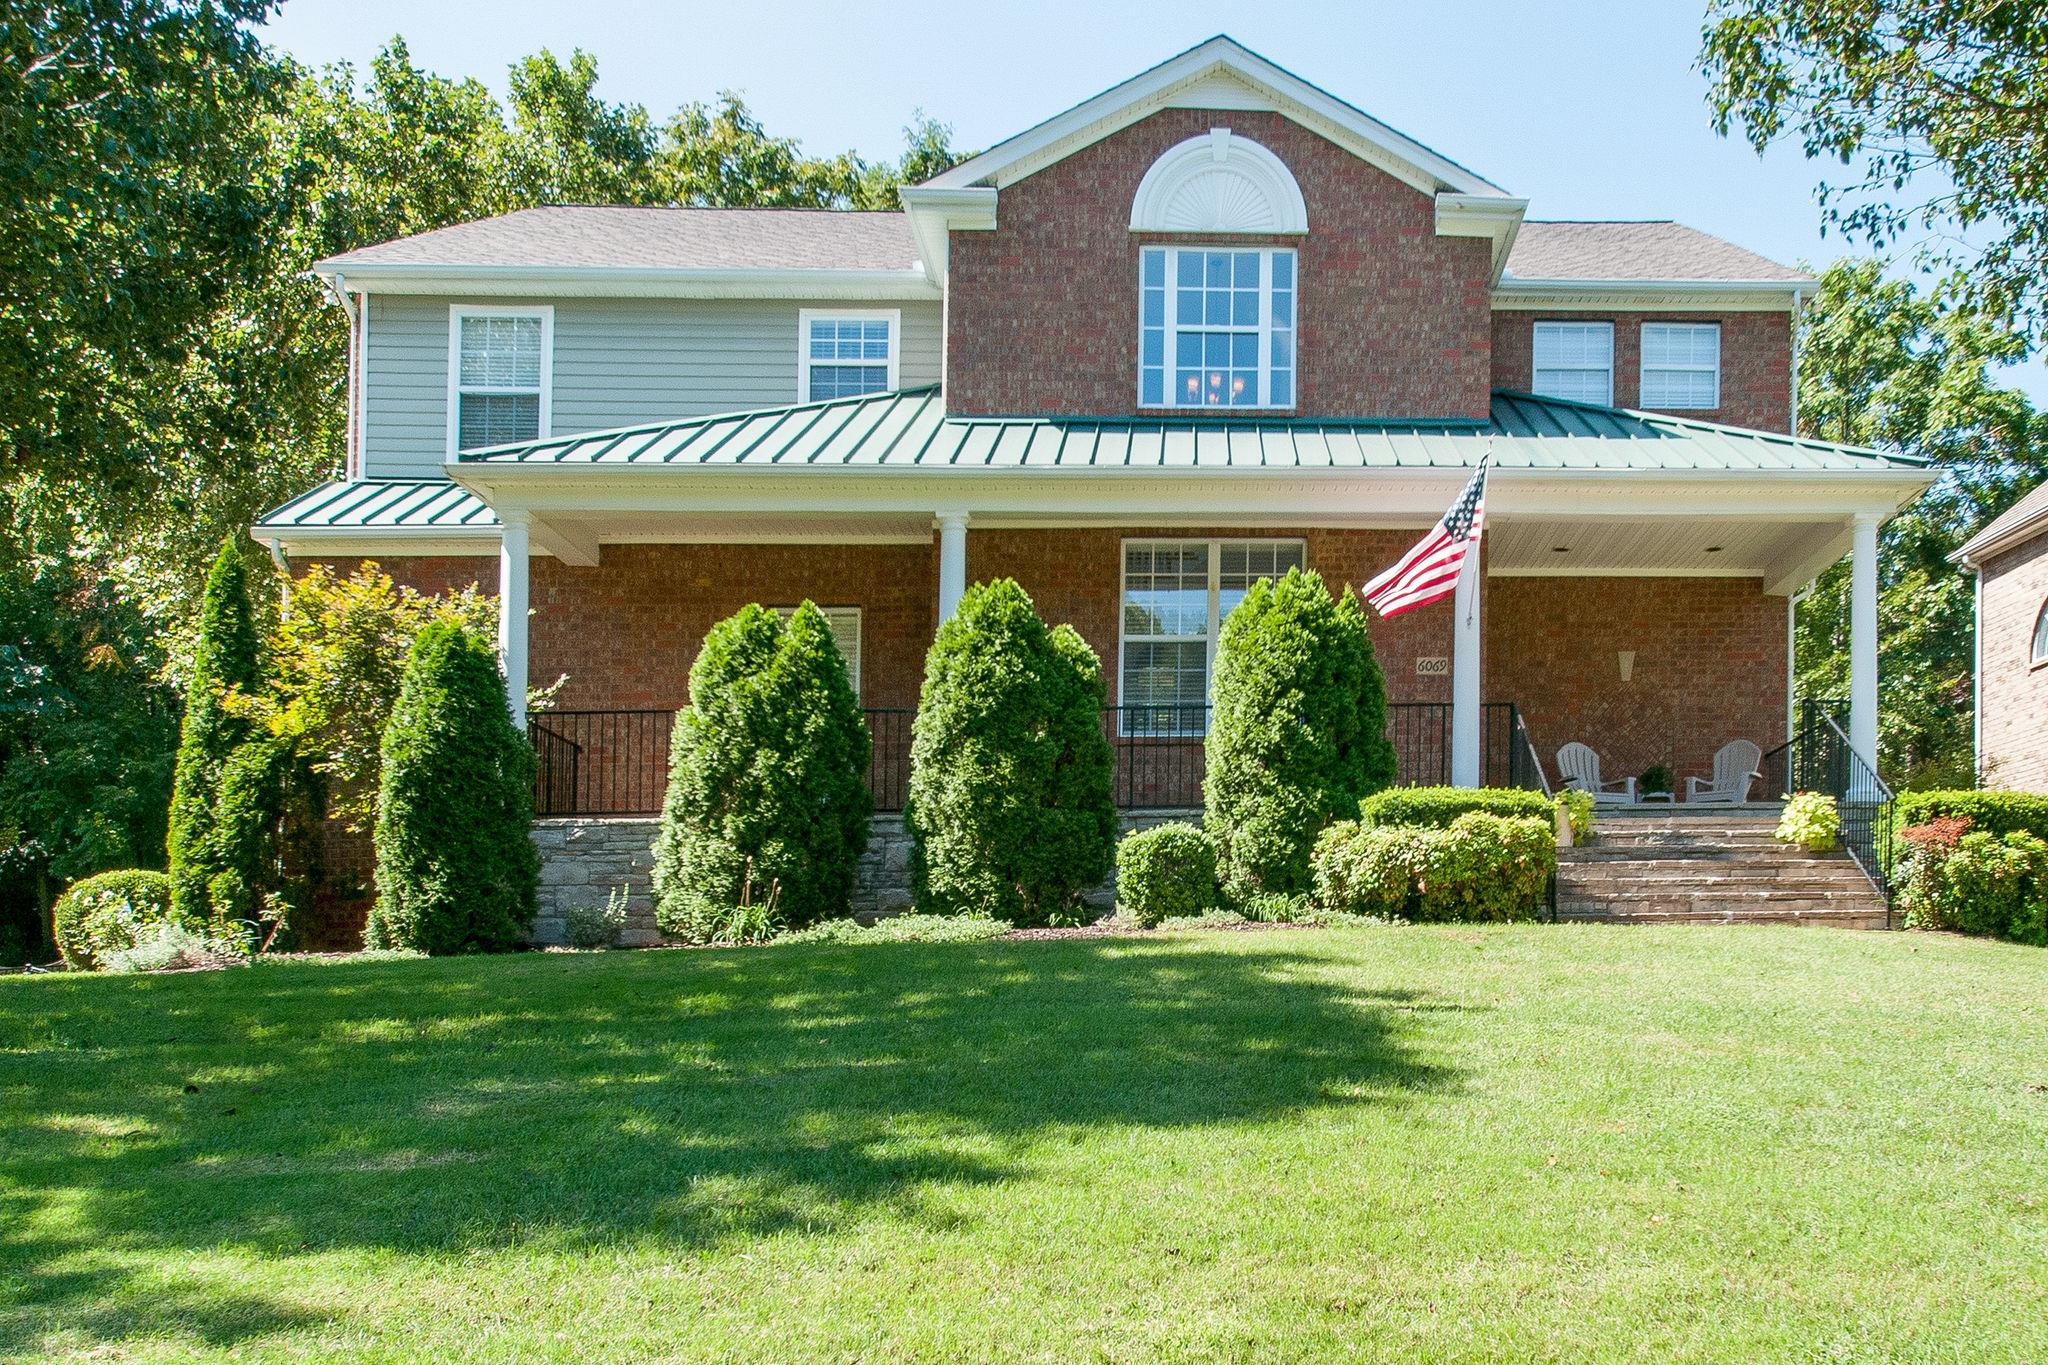 6069 Frontier Ln, Nashville, TN 37211 - Nashville, TN real estate listing